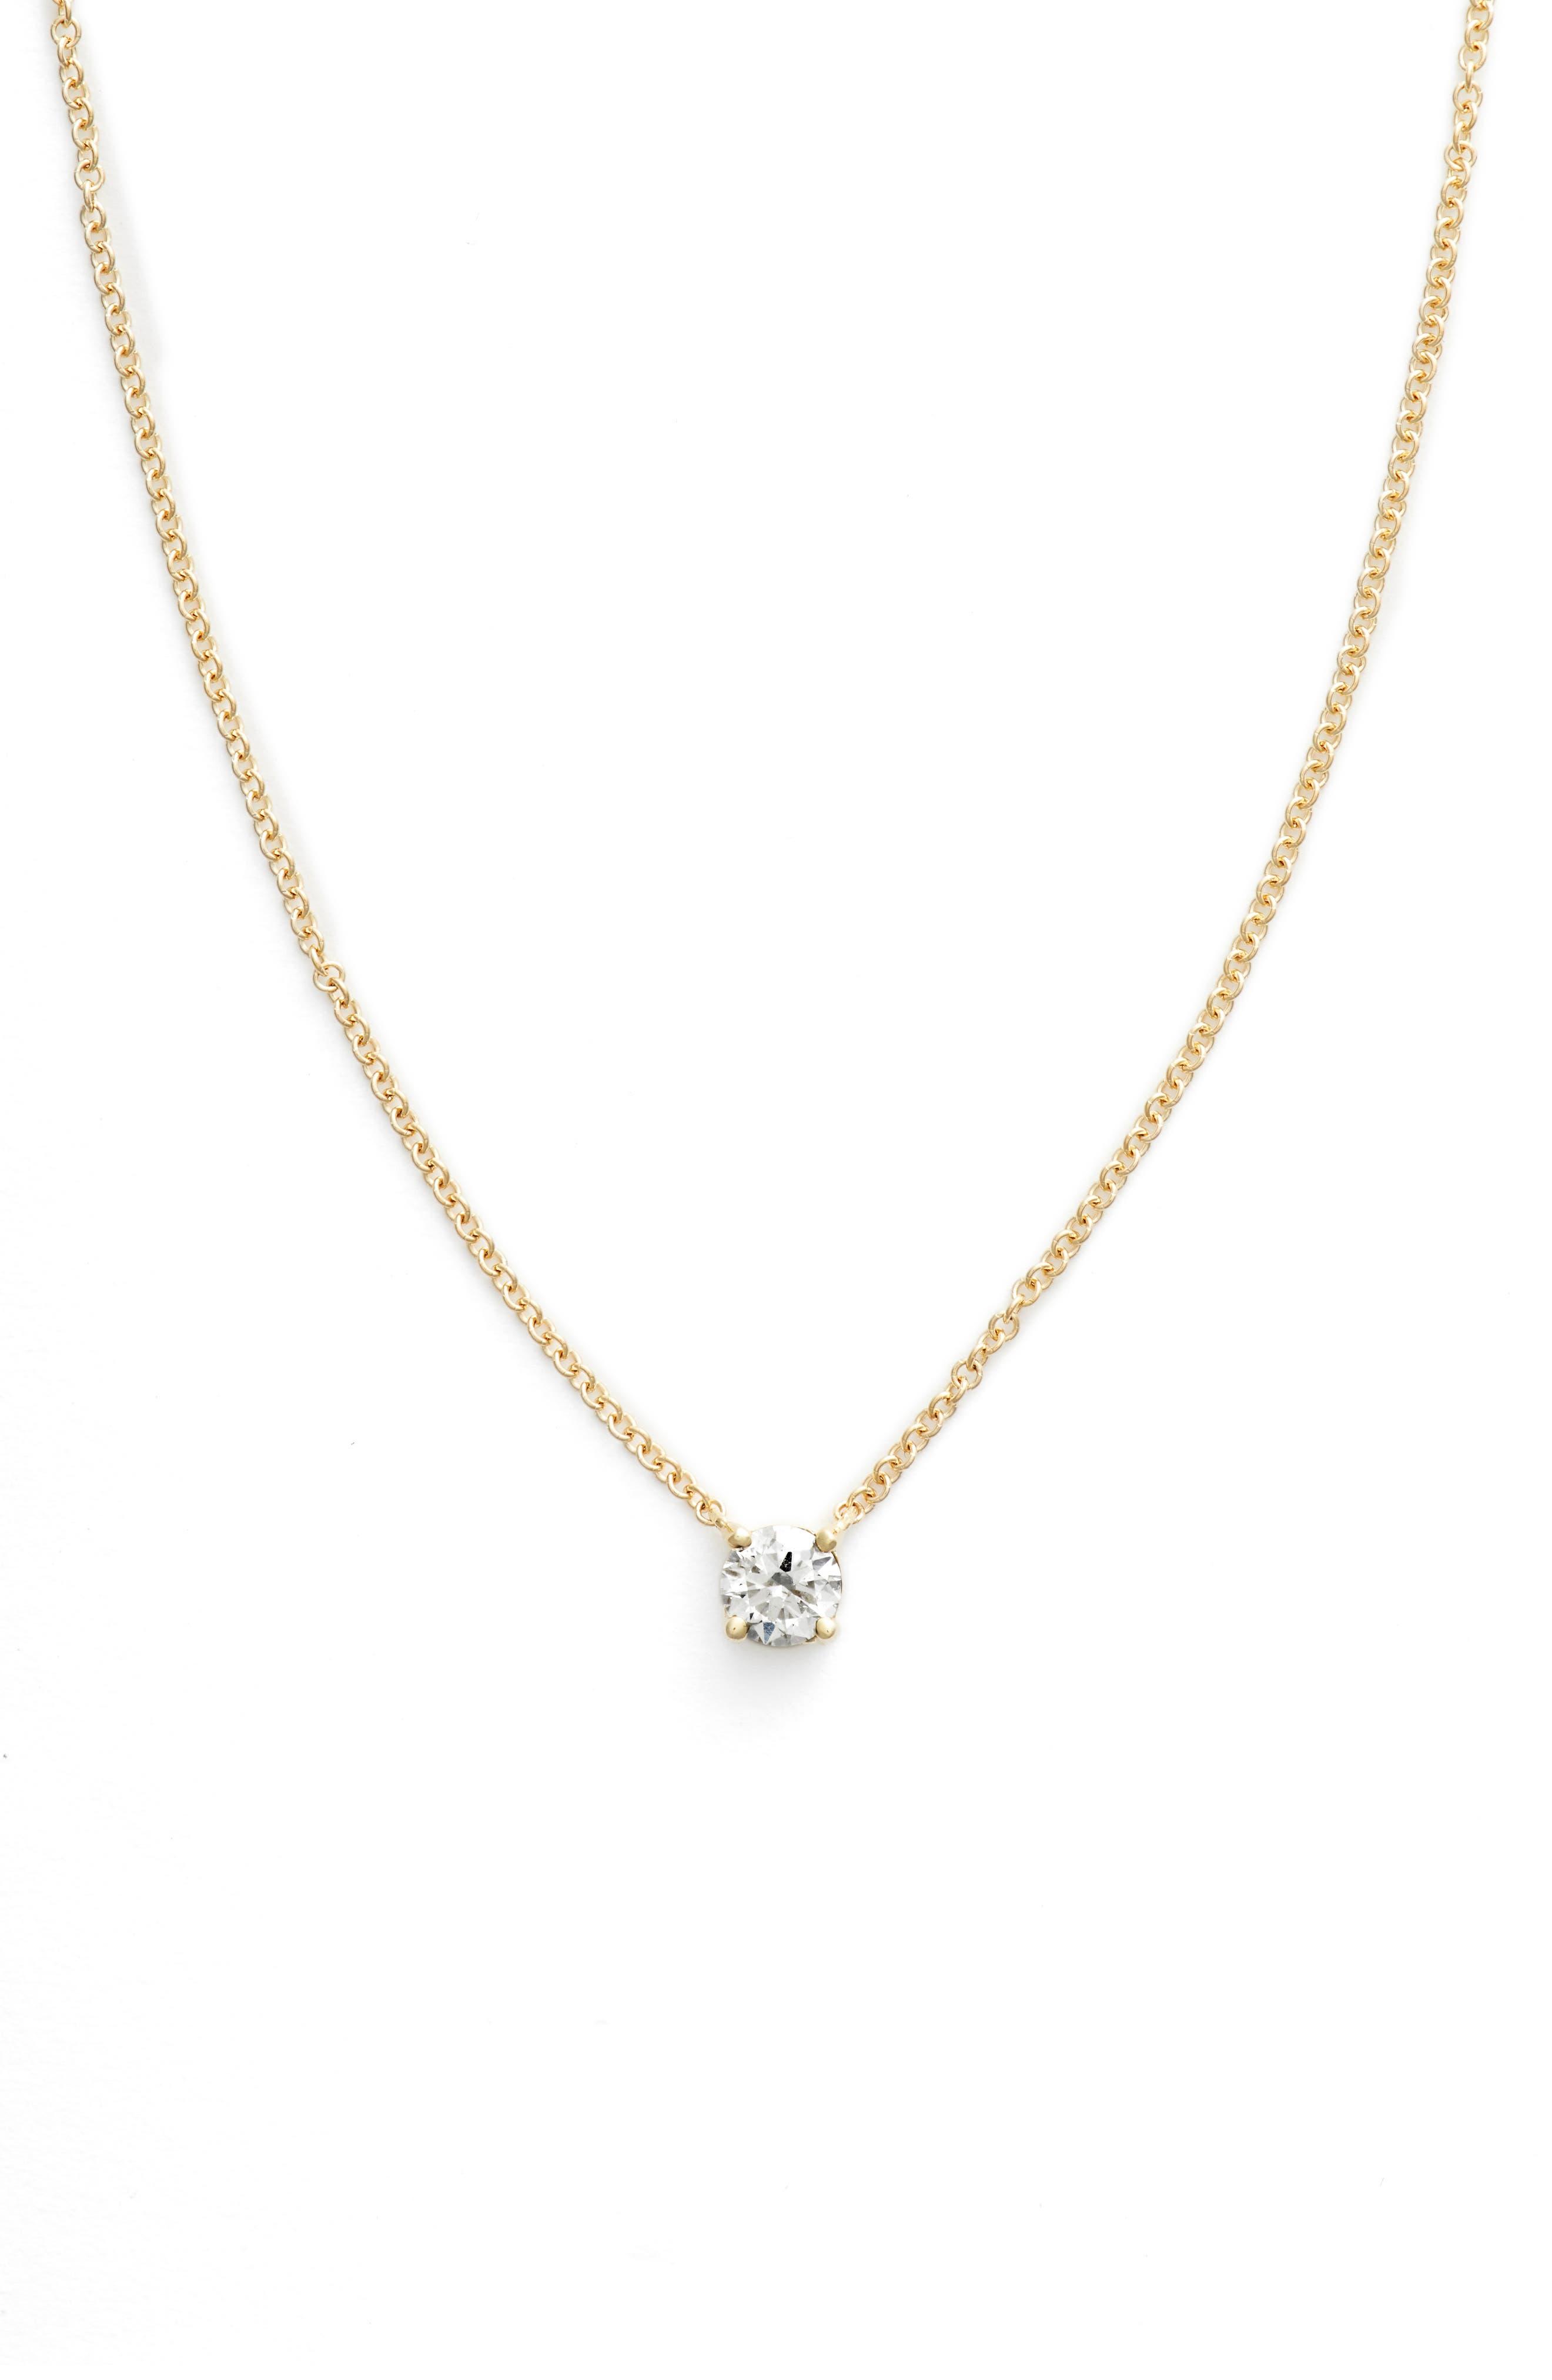 BONY LEVY, Liora Solitaire Diamond Pendant Necklace, Main thumbnail 1, color, YELLOW GOLD